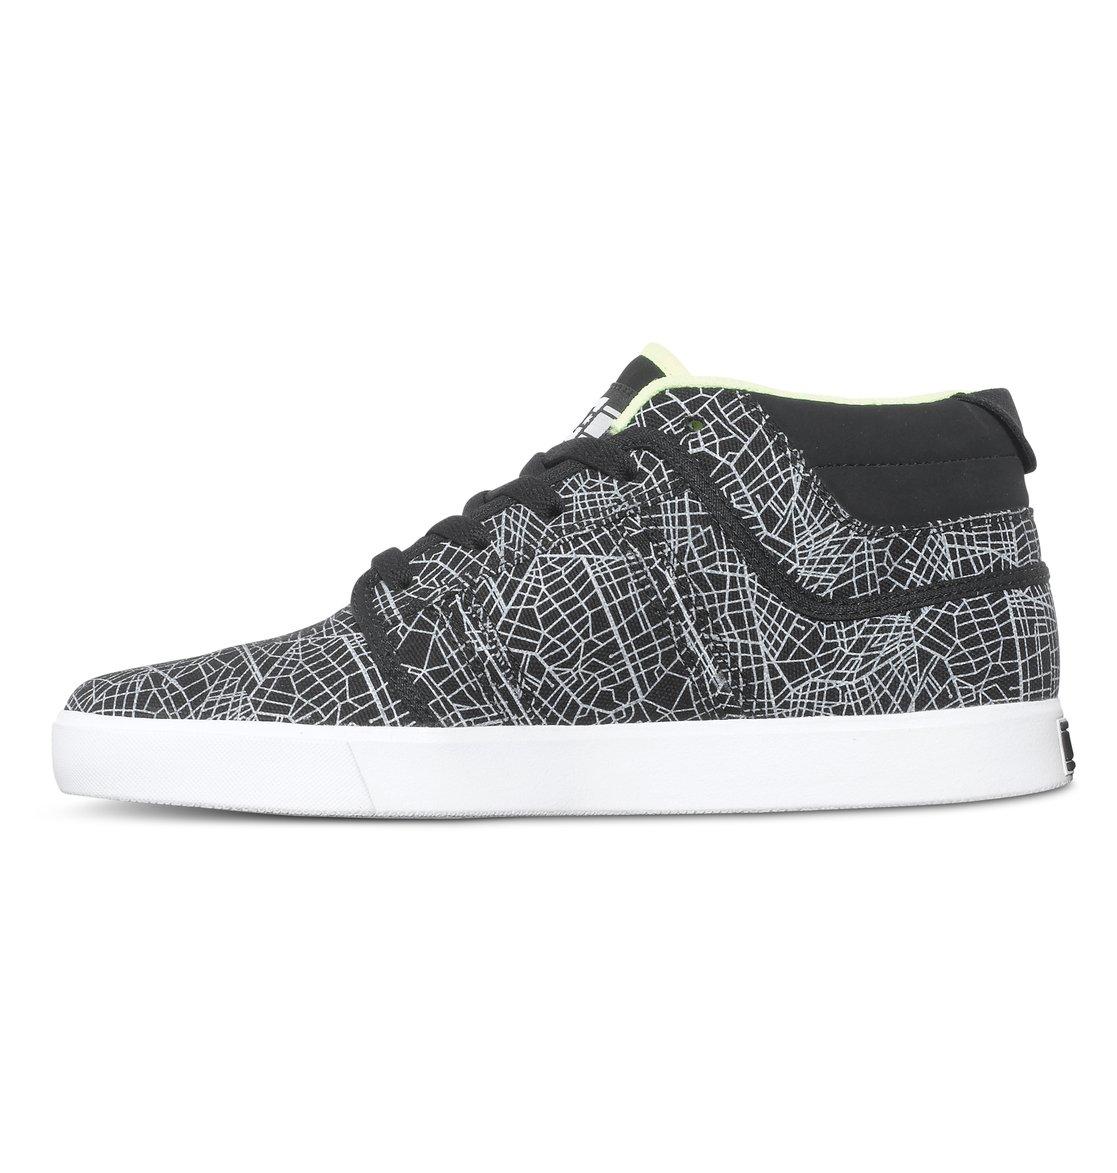 Rob Dyrdek Dc Shoes Uk